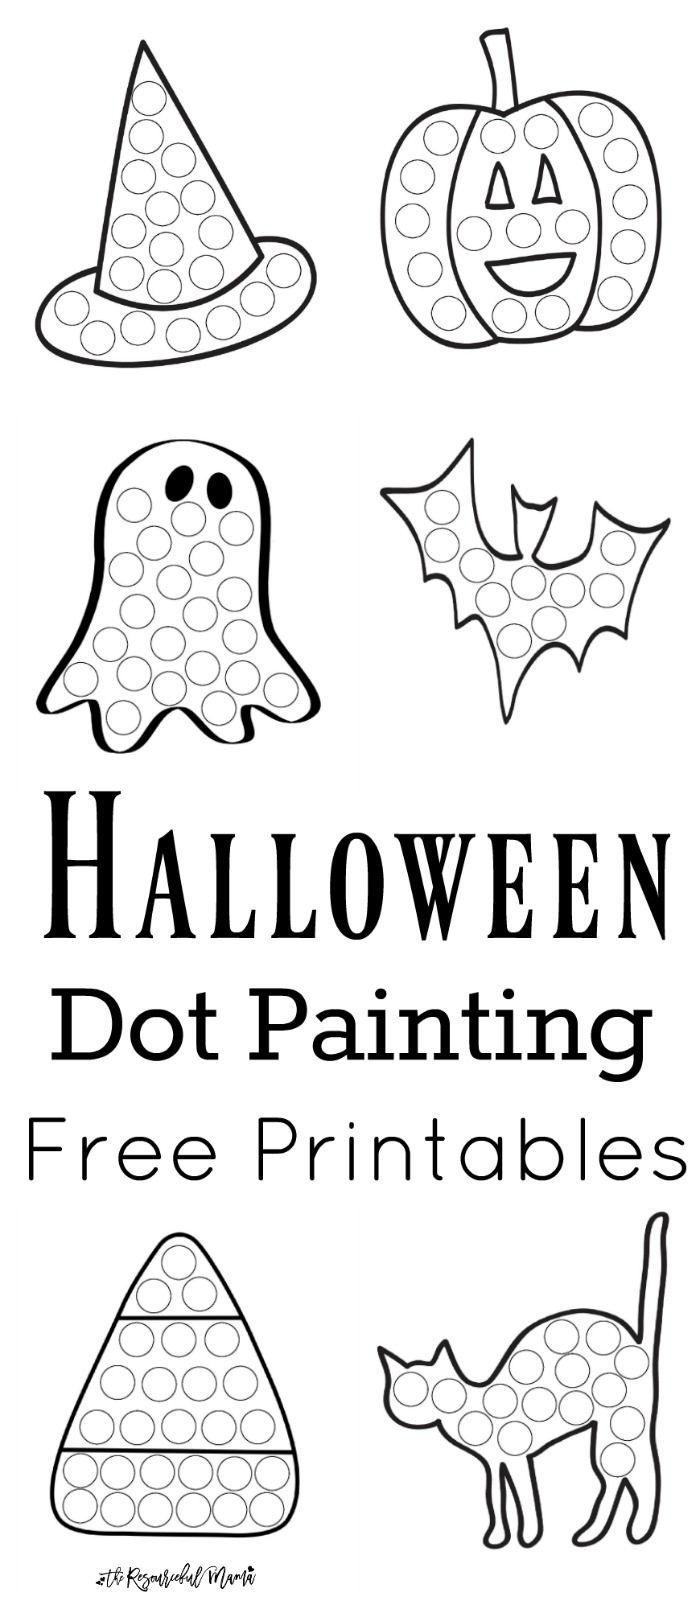 Halloween Dot Painting {Free Printables} | Halloween | Painting - Free Dot Painting Printables